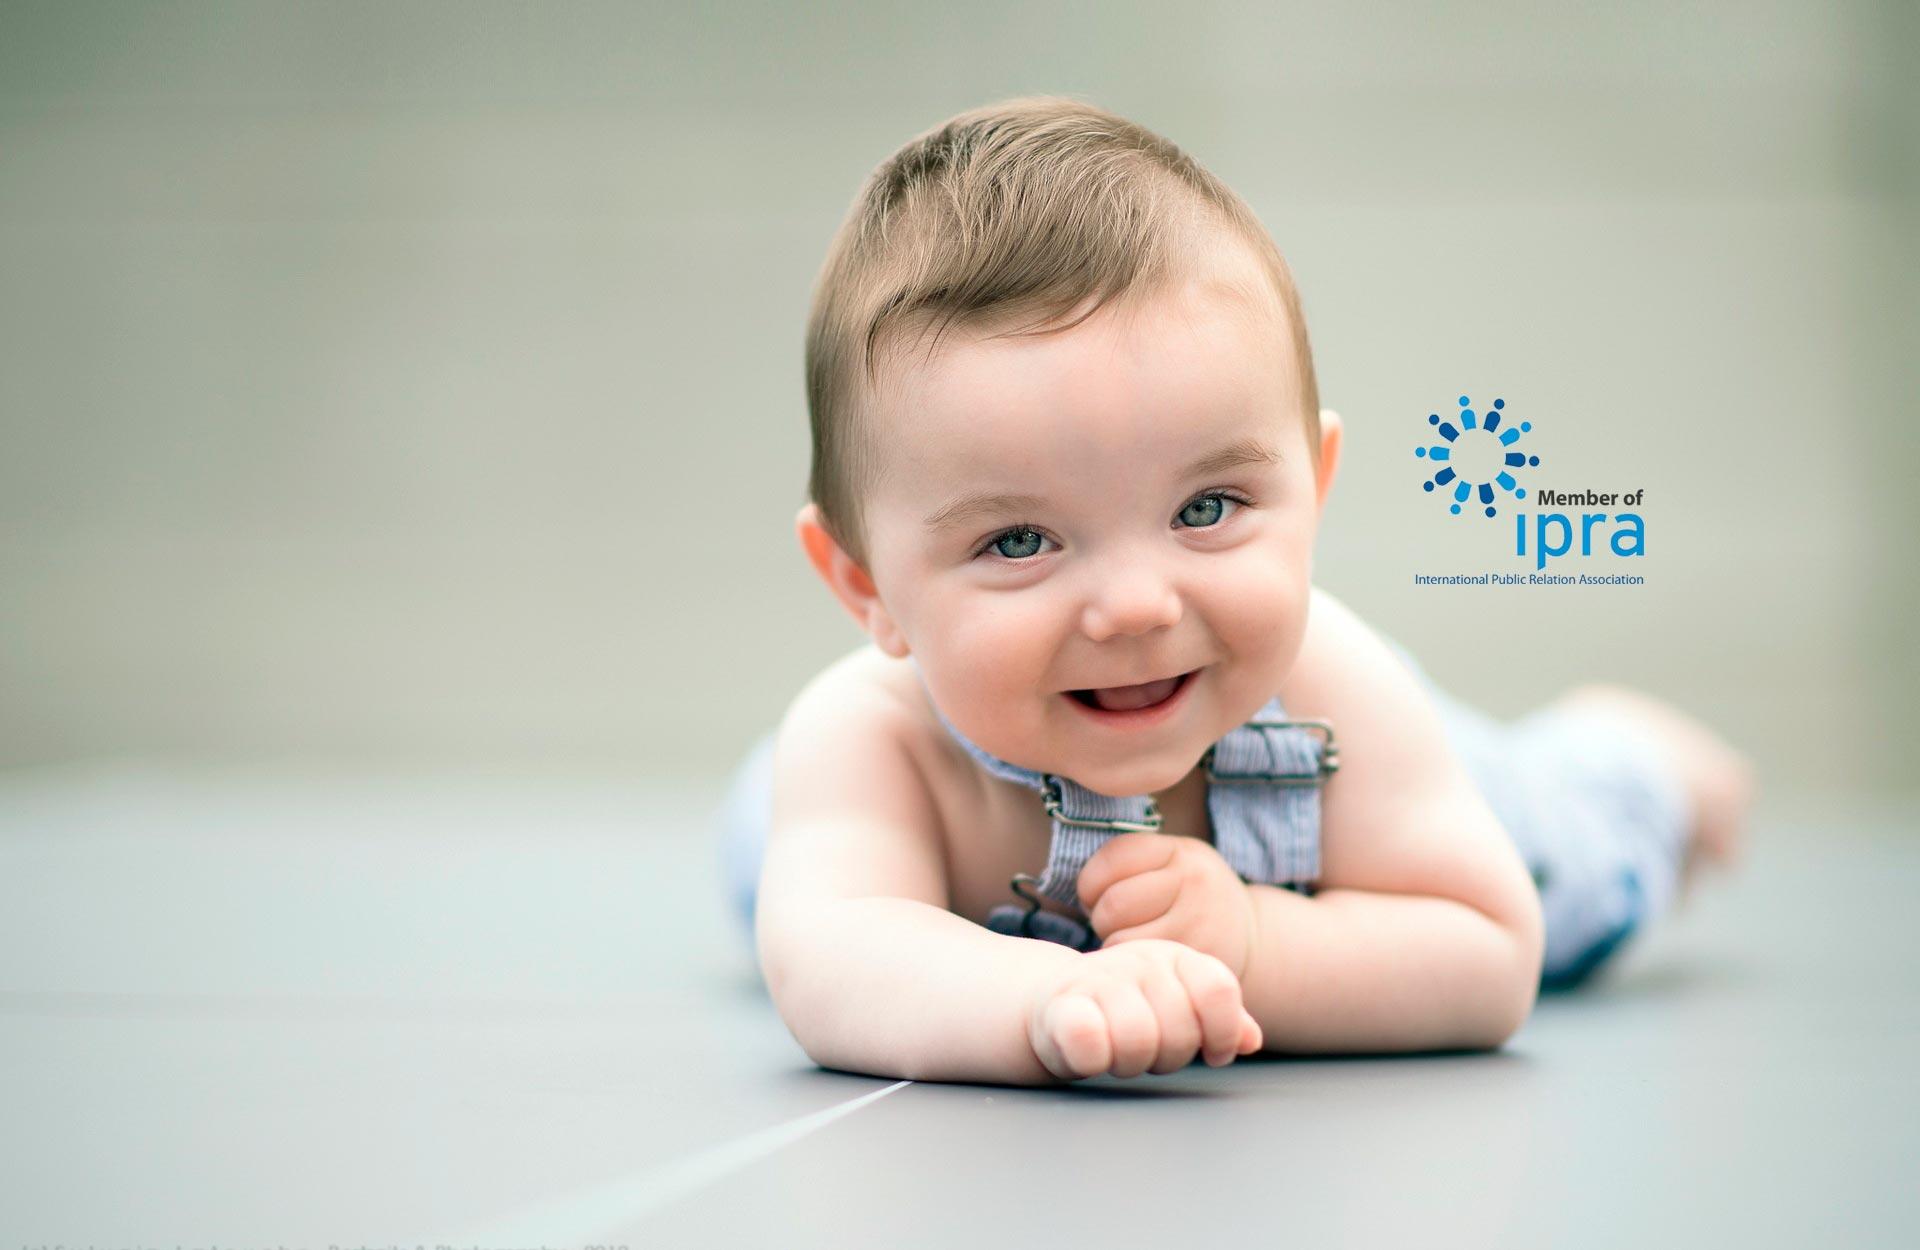 slider_child_smile_mood